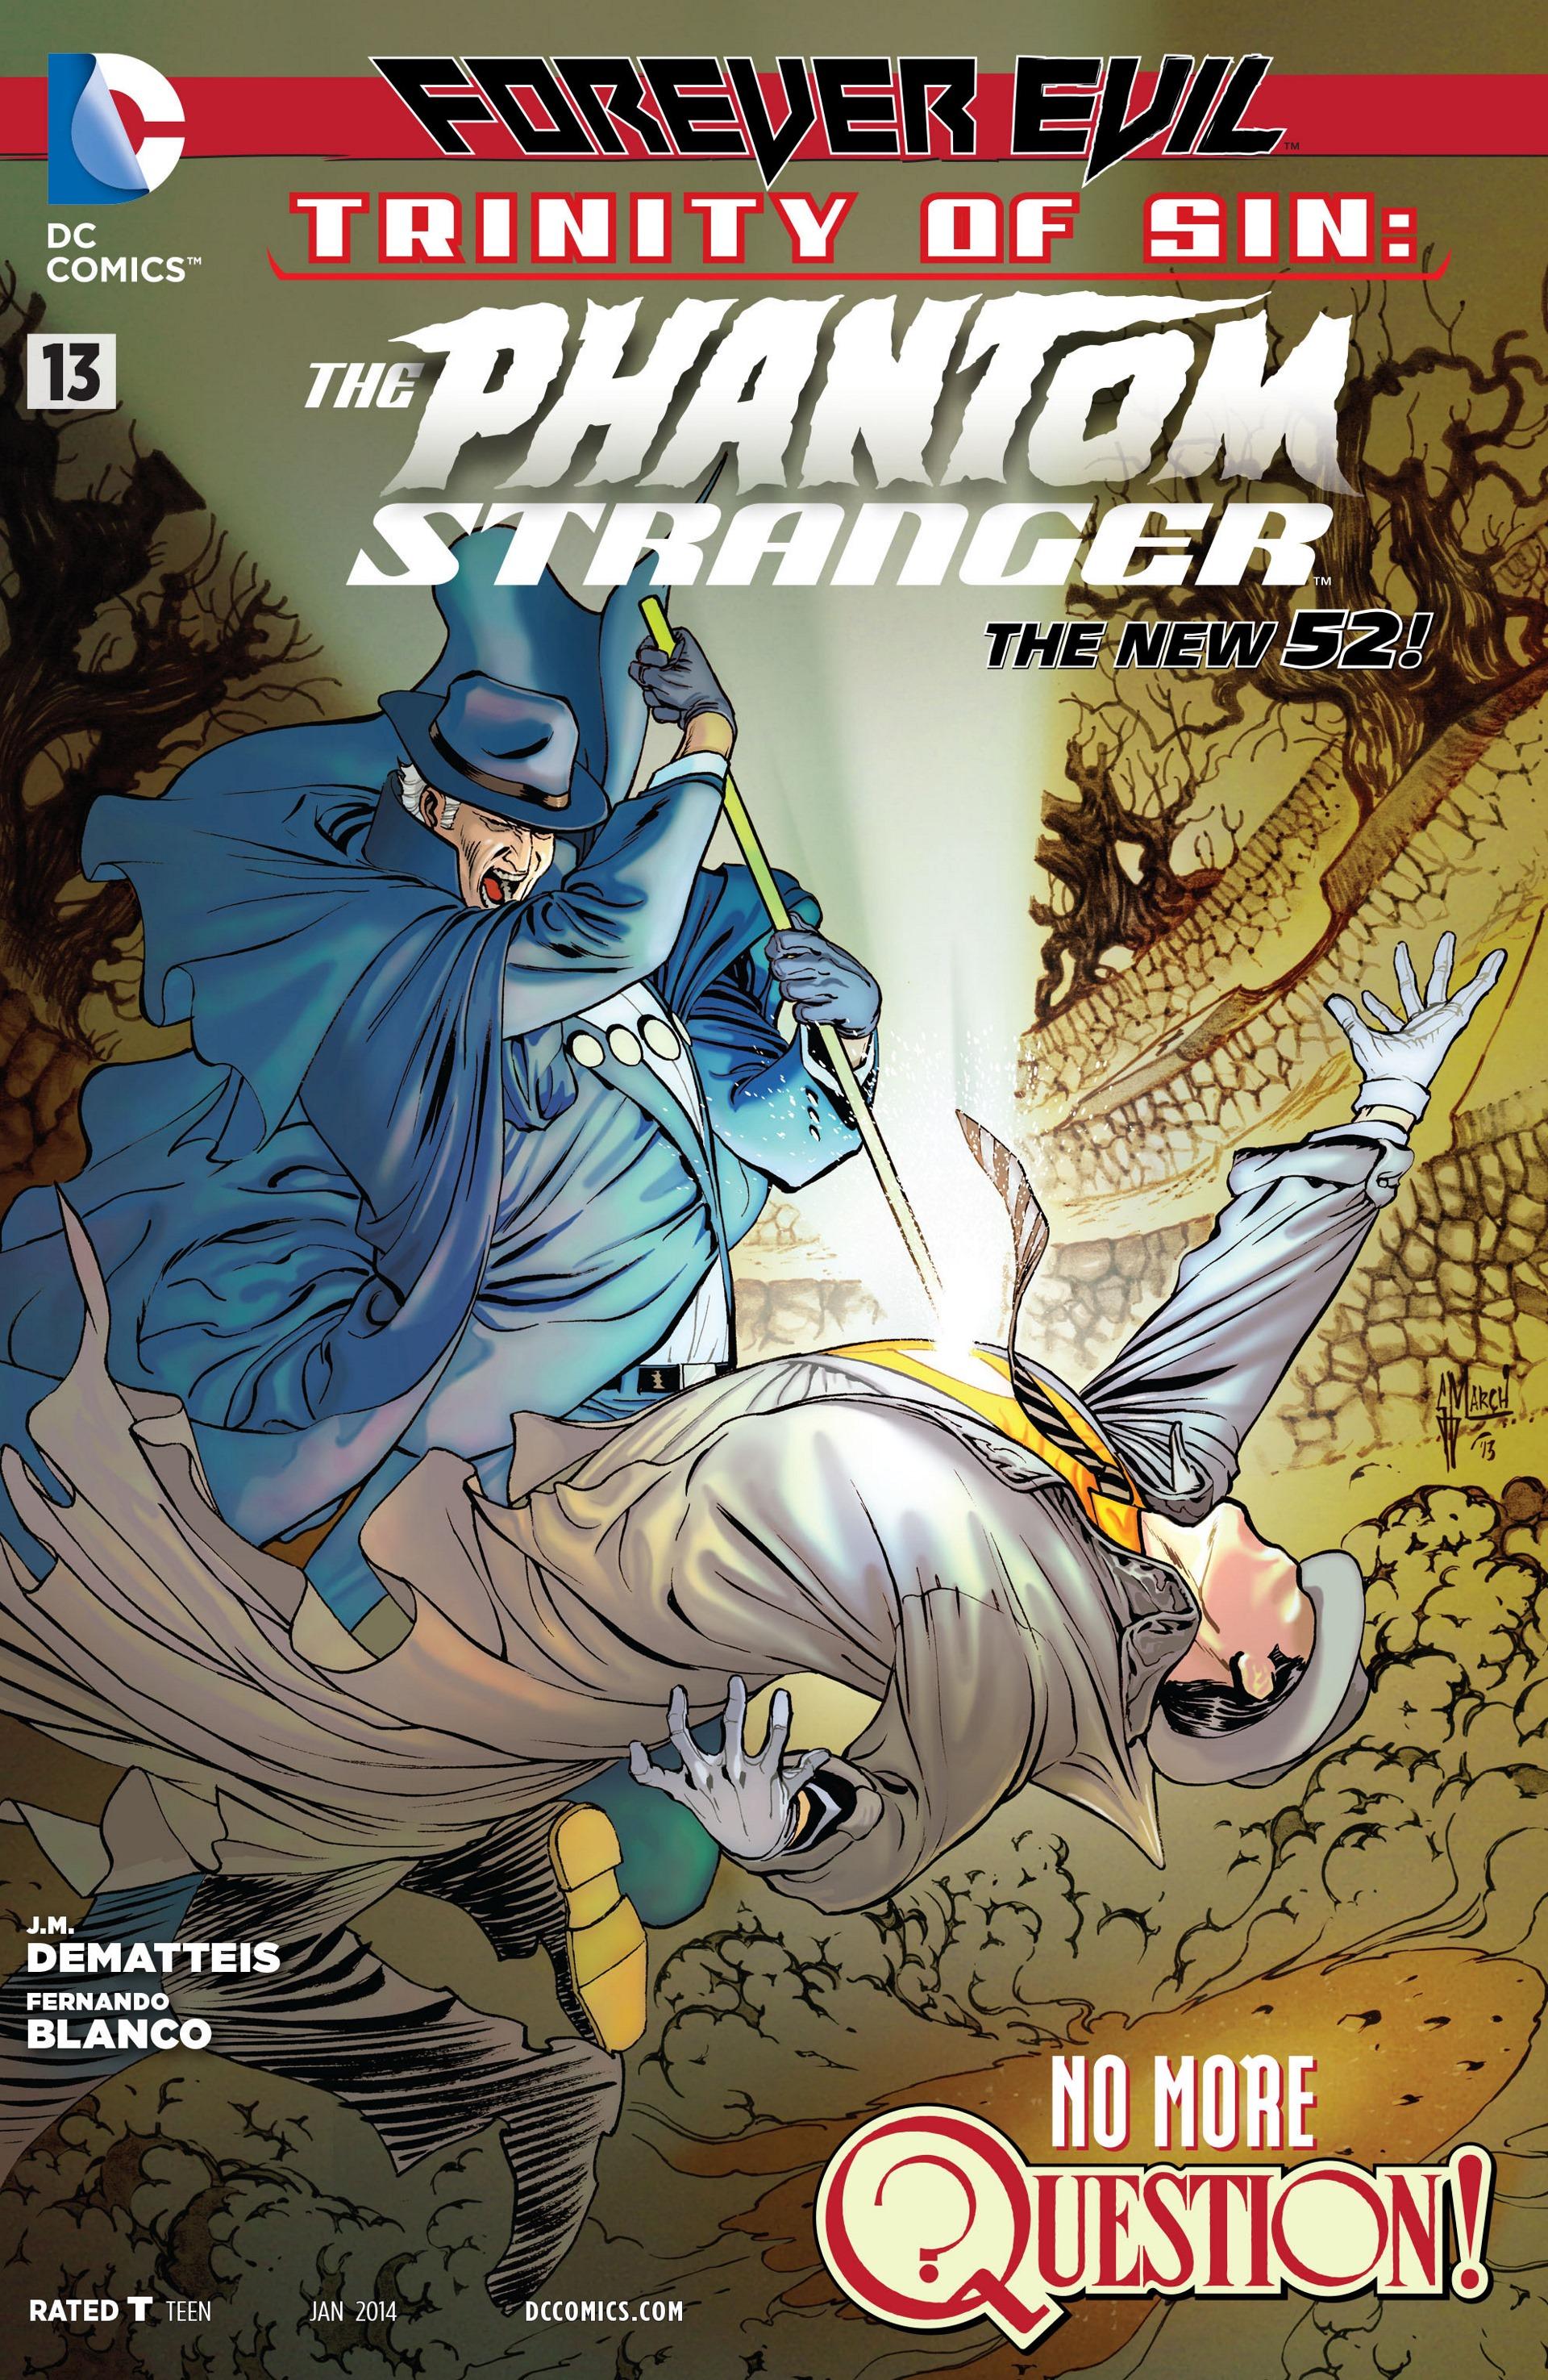 Trinity of Sin: The Phantom Stranger Vol 1 13